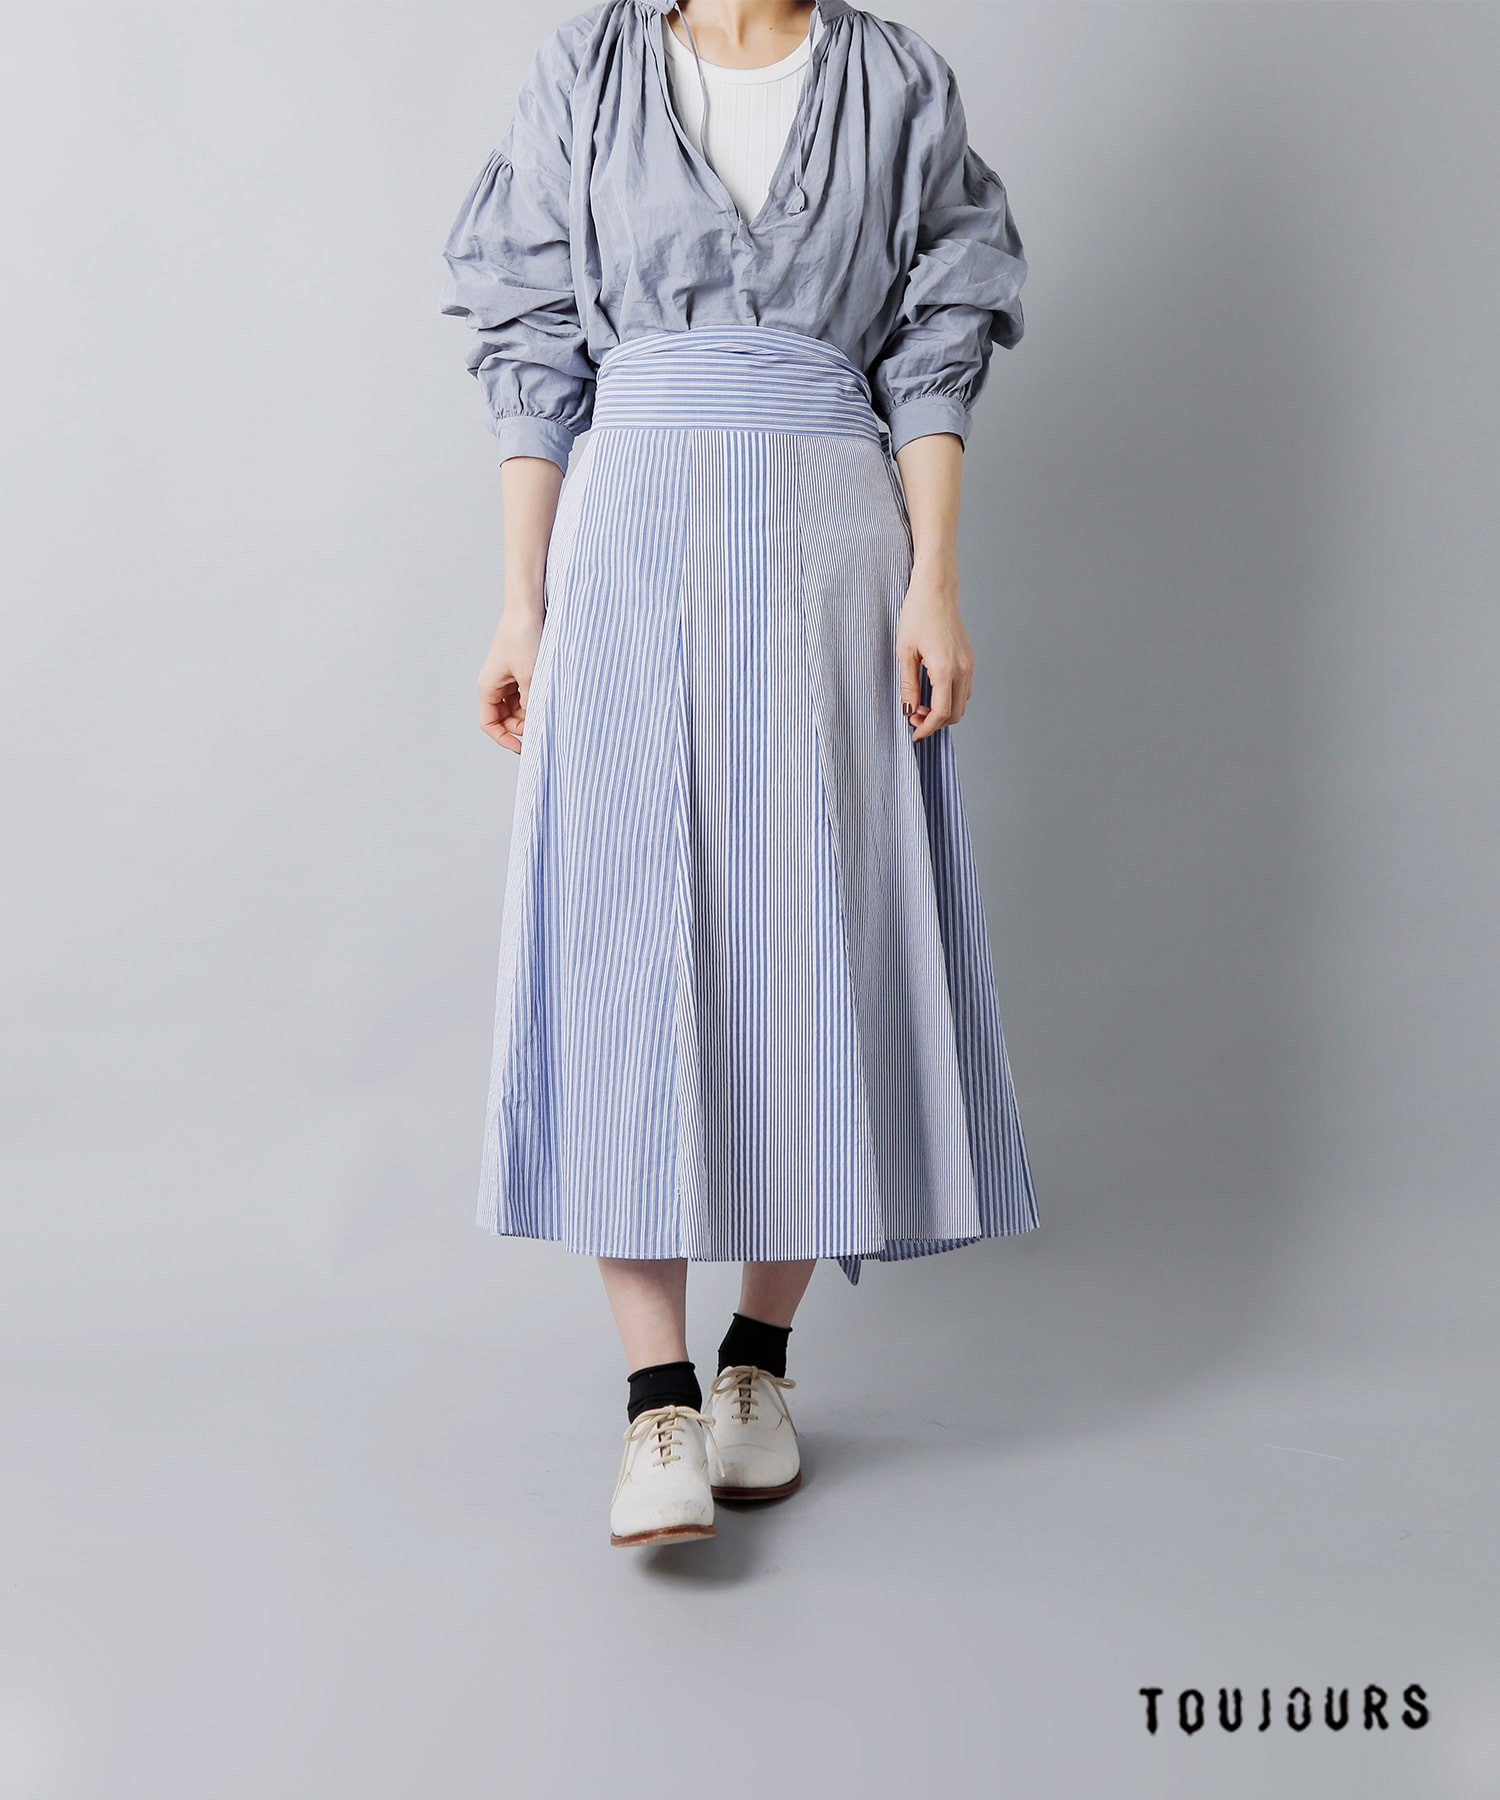 "TOUJOURS(トゥジュー)コンビネーションタイスカート""Thai Style Flared Combination Skirt"" km30tk03"